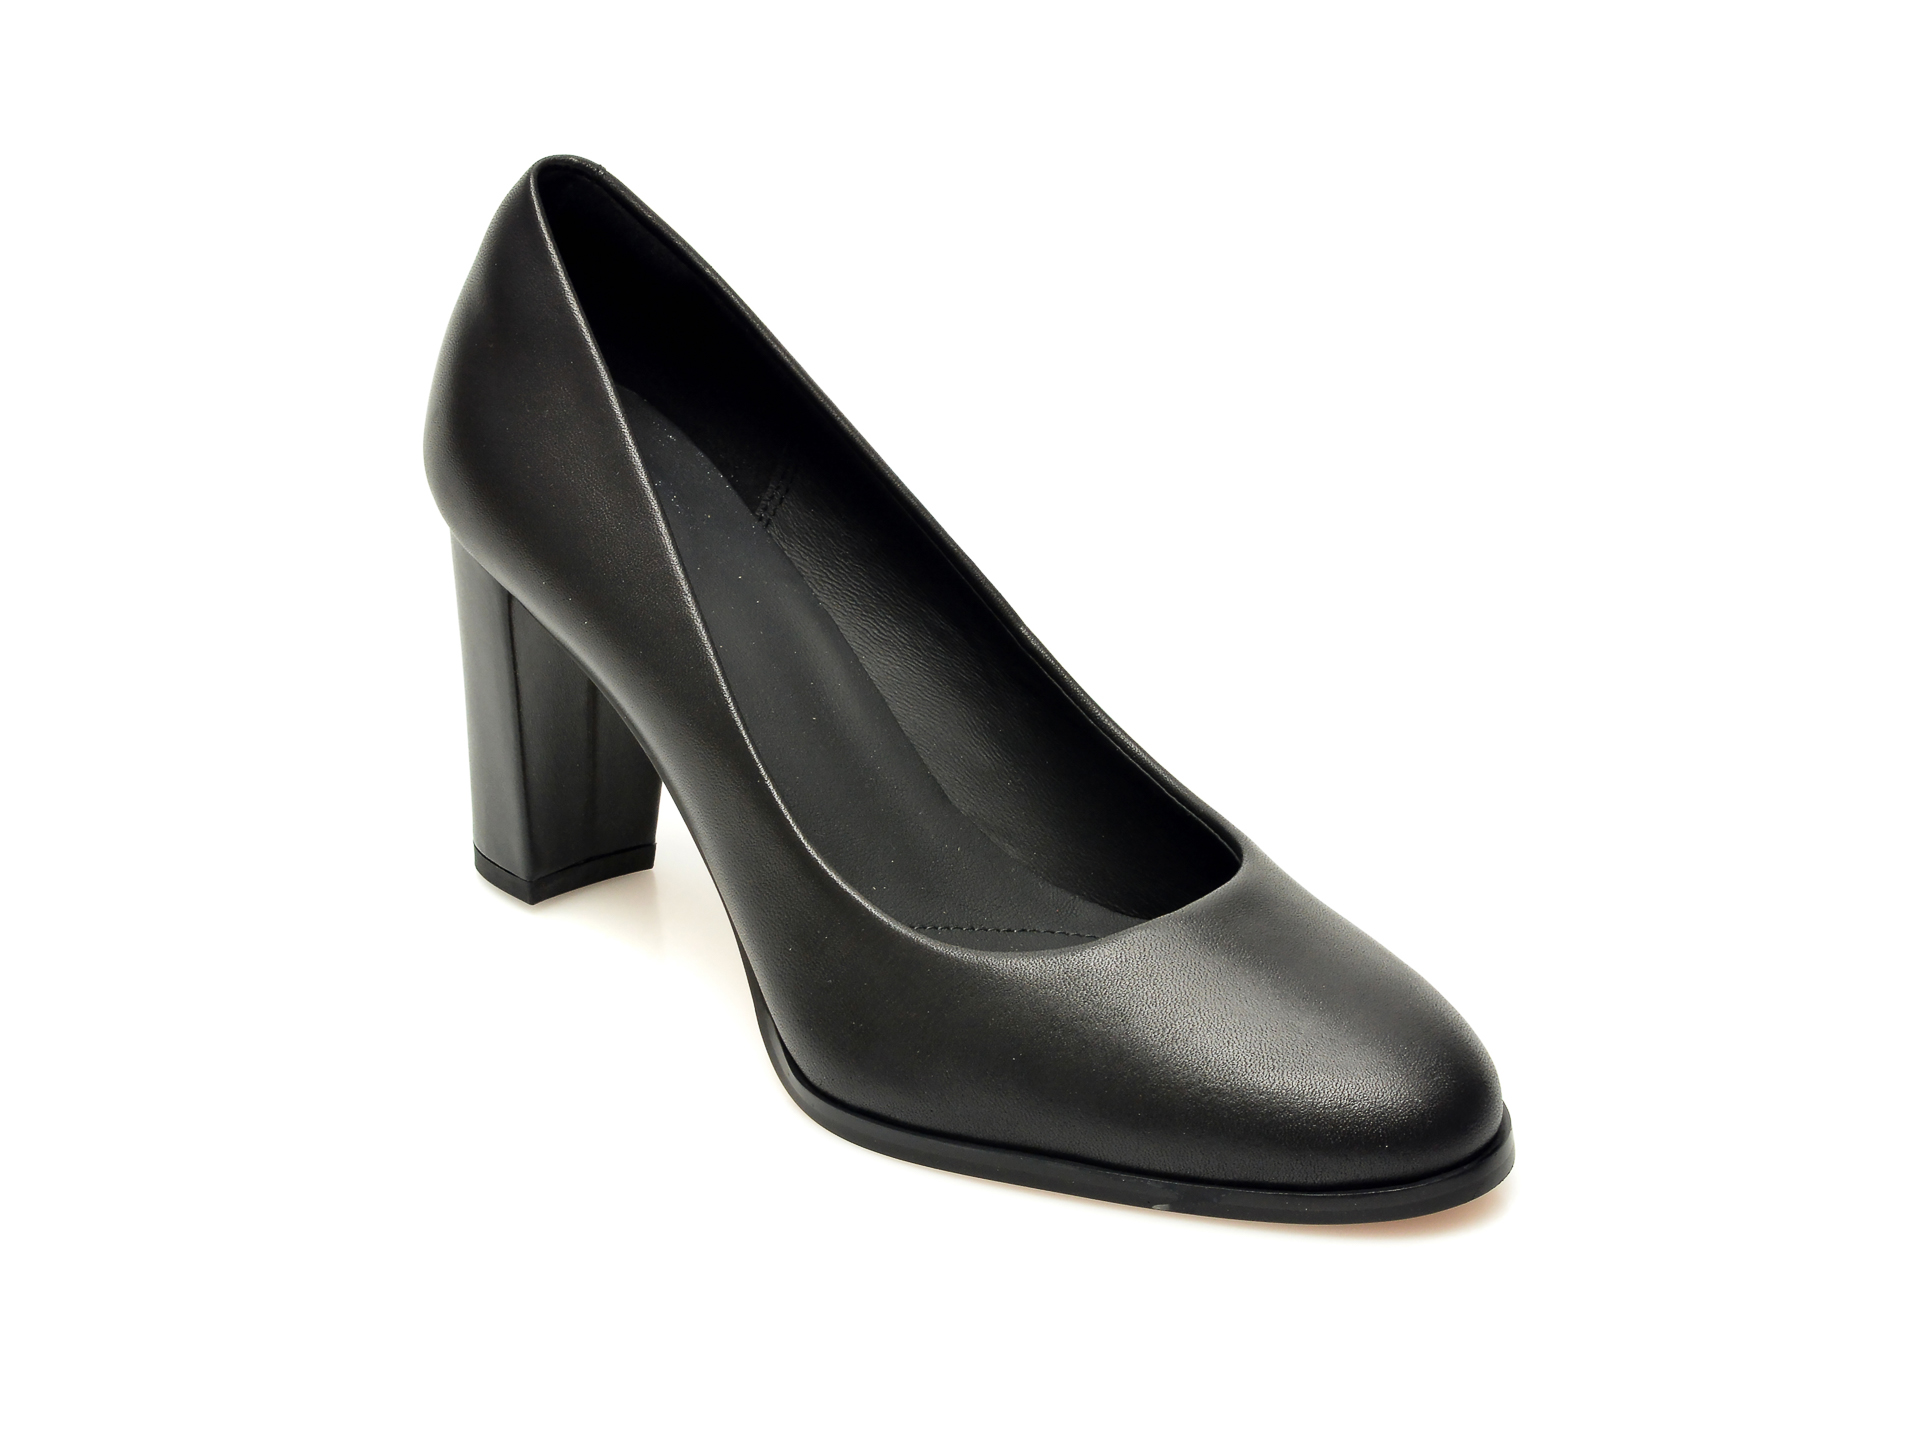 Pantofi CLARKS negri, Kaylin Cara 2, din piele naturala imagine otter.ro